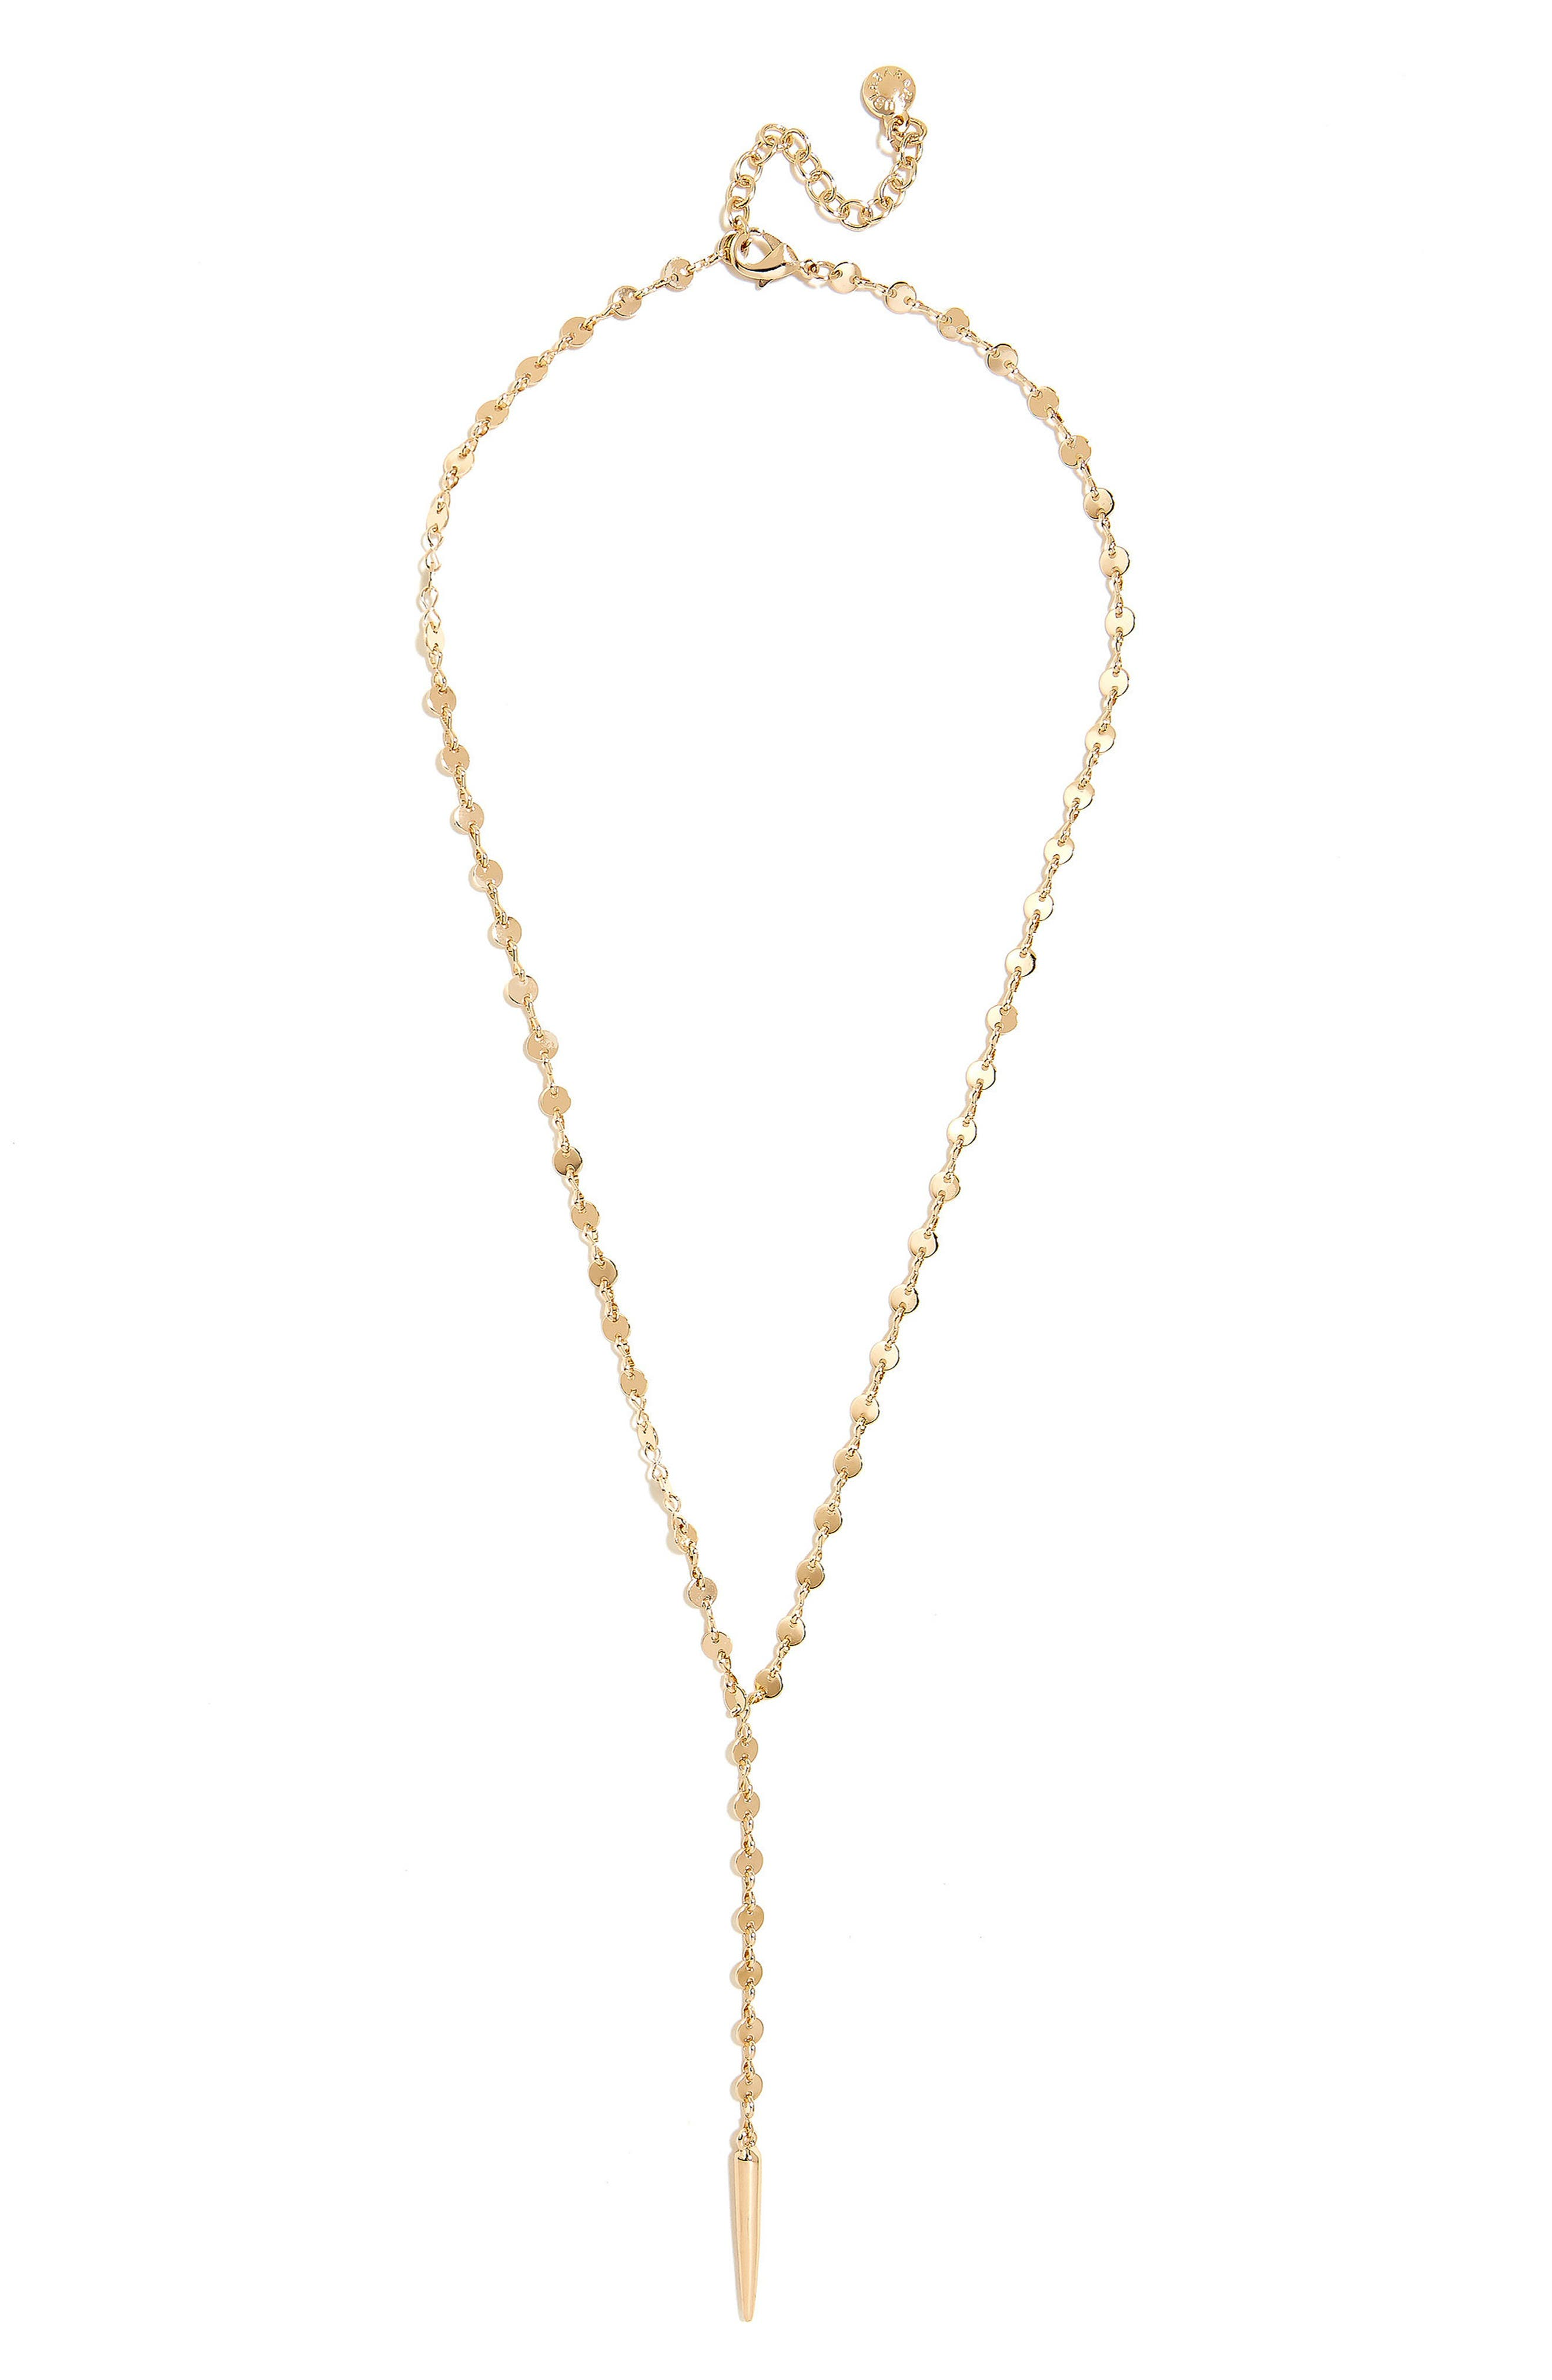 Claire Y-Necklace,                         Main,                         color, GOLD